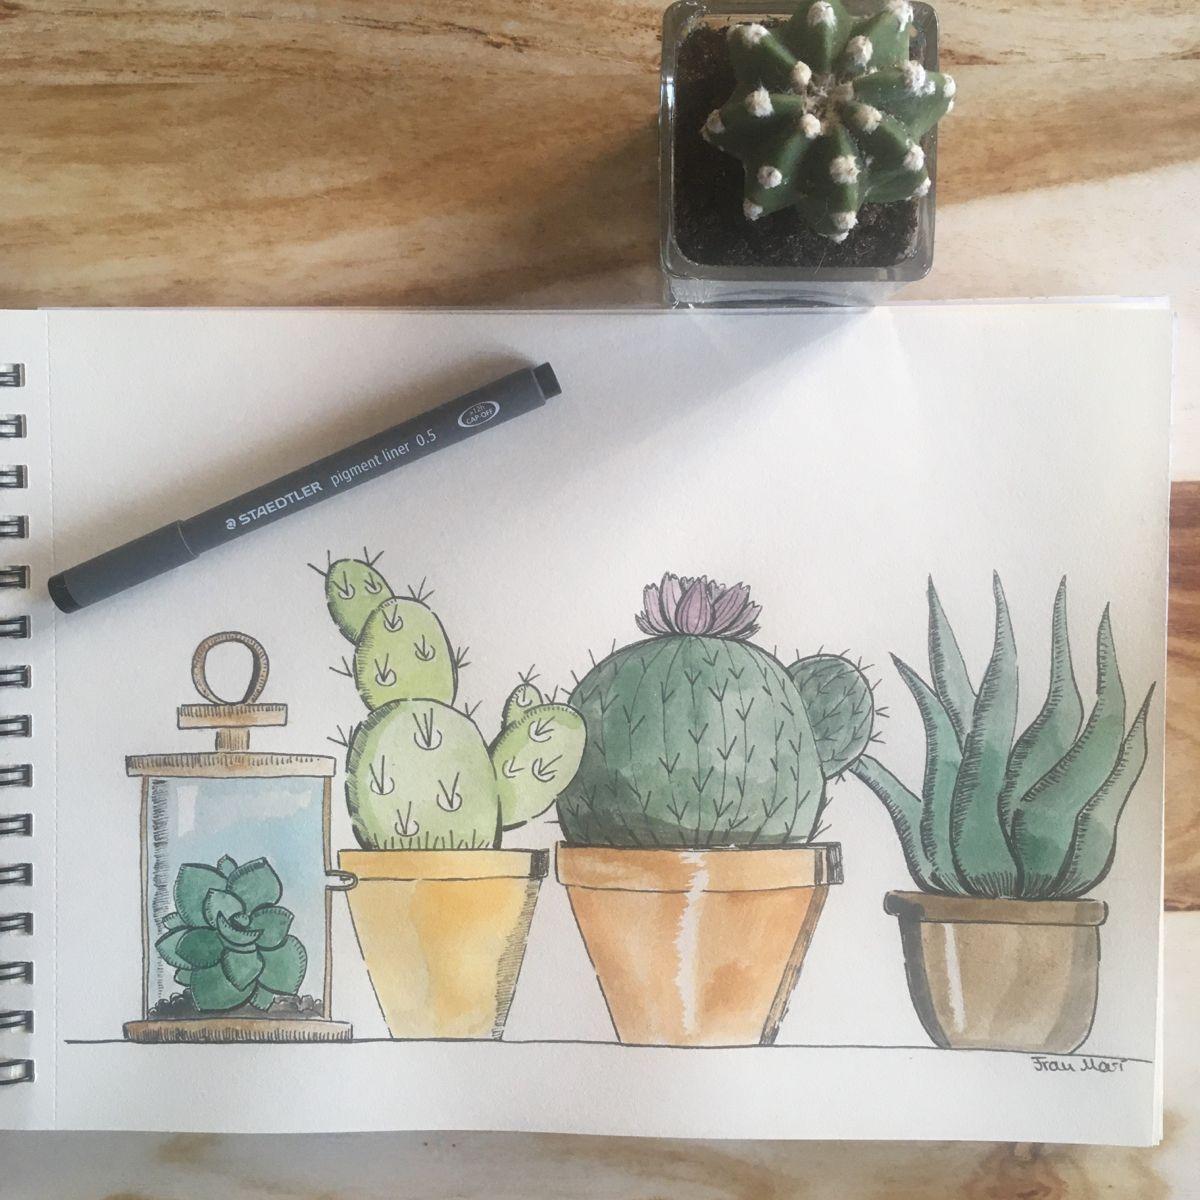 This original beautiful cactus family (size A4) is looking for a new home. Find more of my art on Instagram @frau_mari_illustration   #watercolorillustration #cactusart #watercolorart #watercolorartist #illustration #illustrator #howtopaint #acuarela #cottageart #cottagedecor #cottagegarden #cactuslove #cactusplants #kaktus #animalillustration